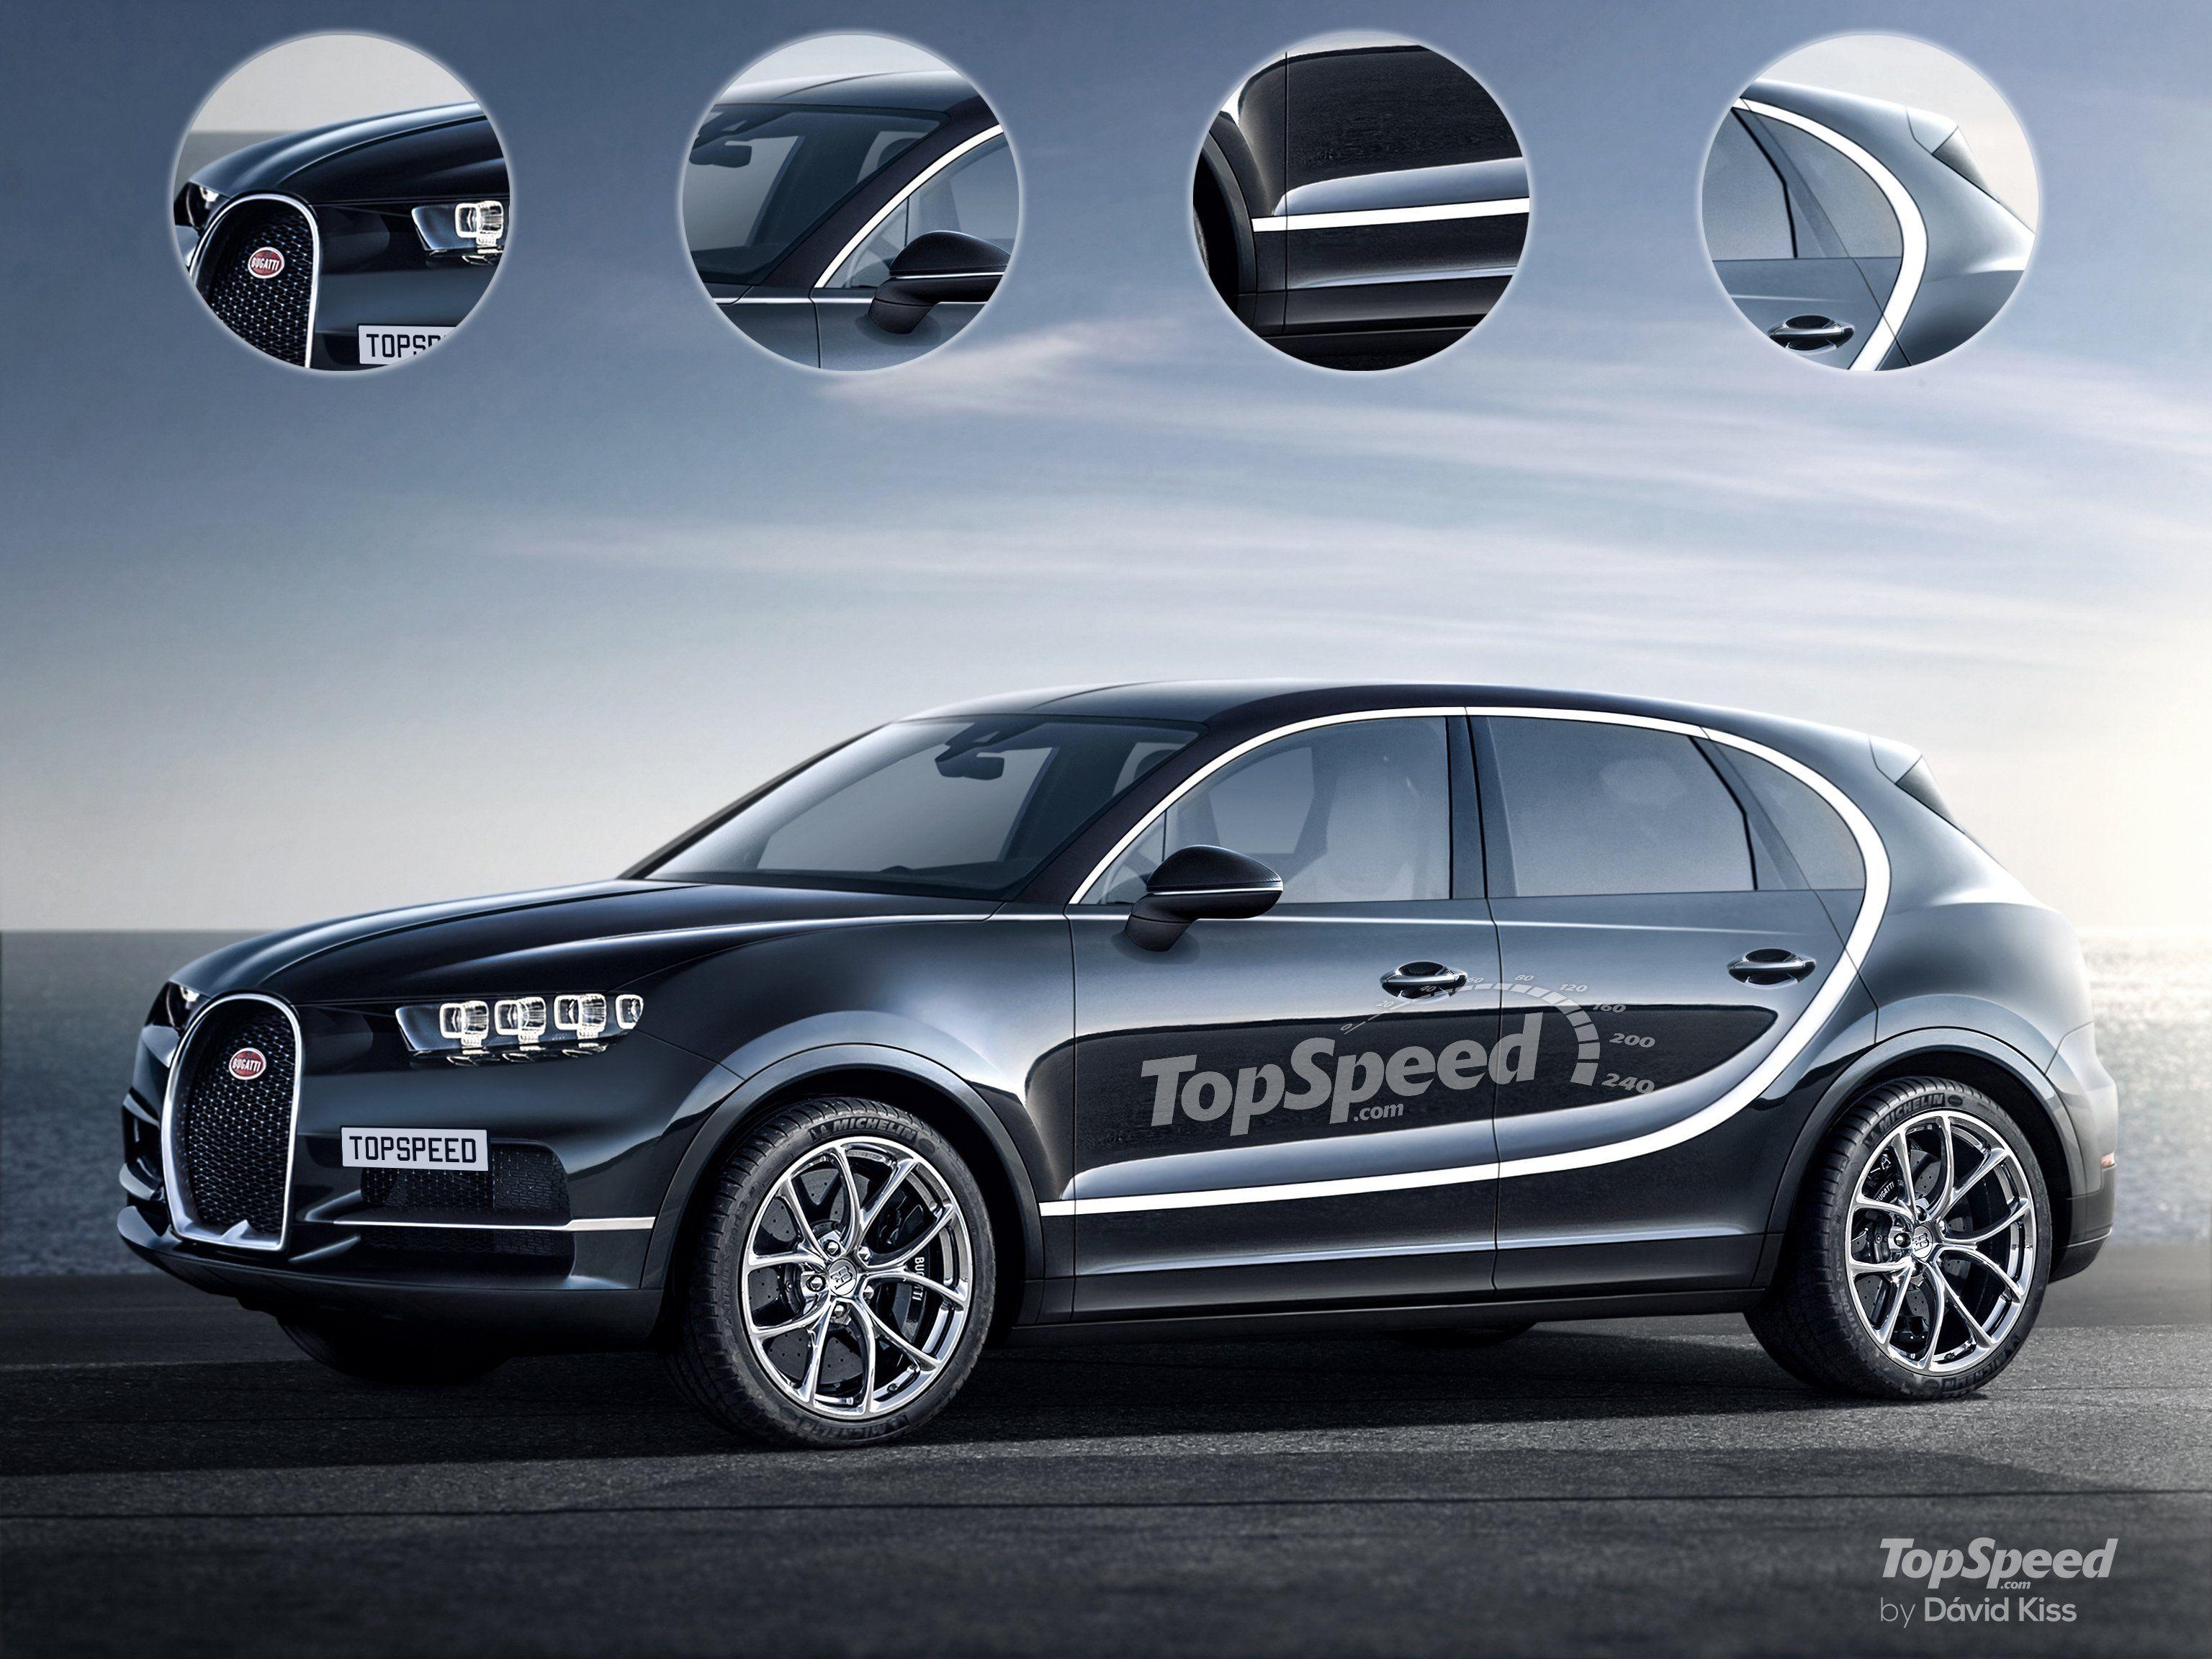 2022 Bugatti Suv Price Photos News Release Review Specs